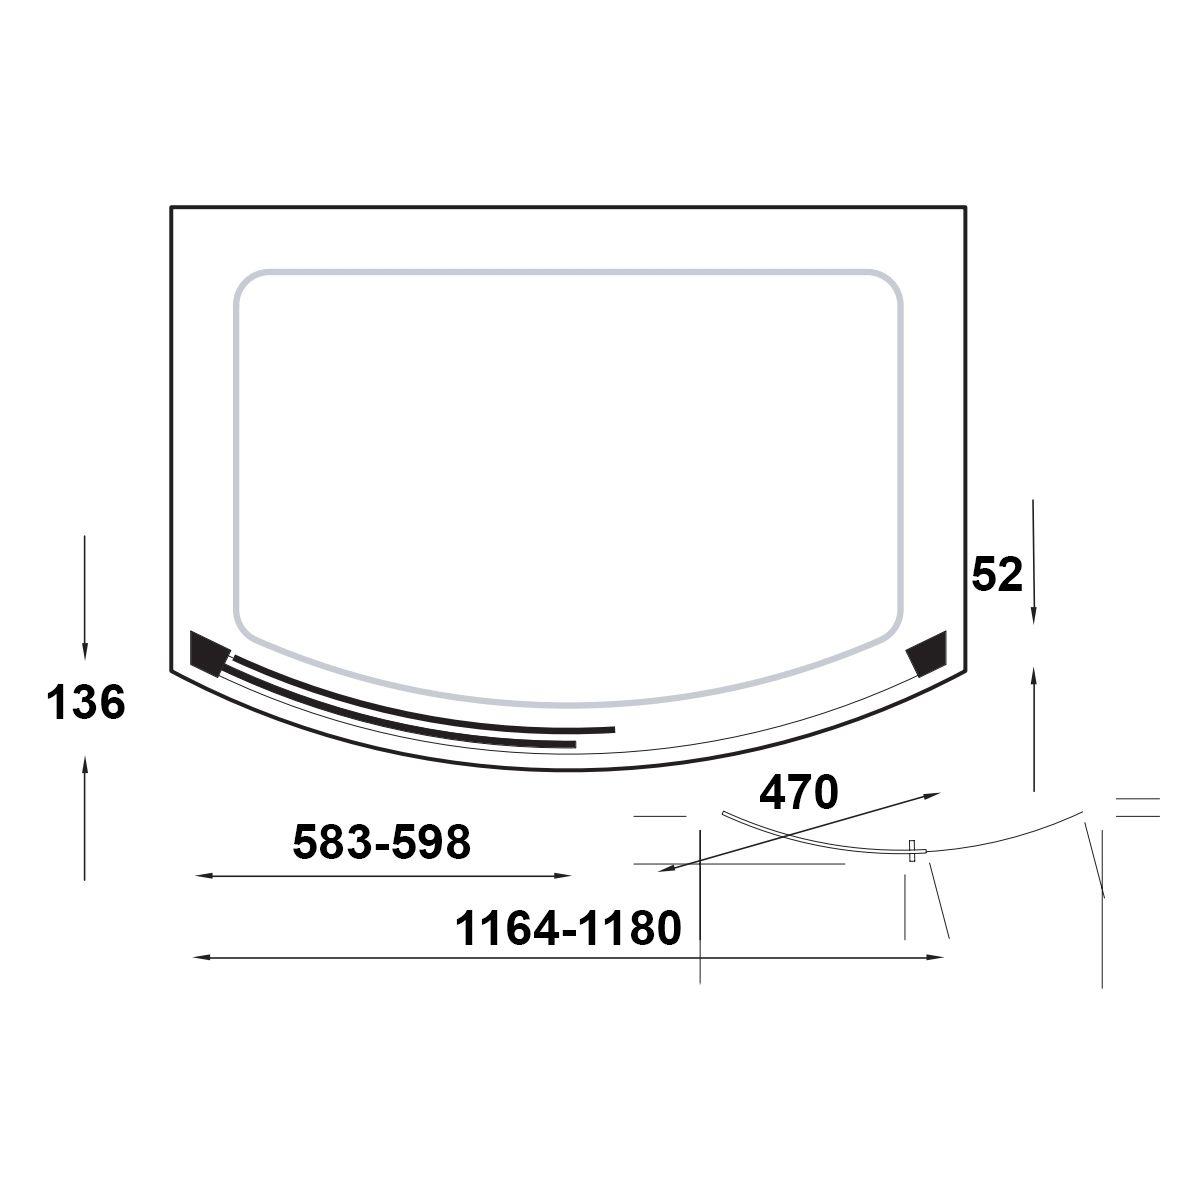 kudosoriginalbowedslidingshowerenclosure1200x700withconcept2showertraydimensions